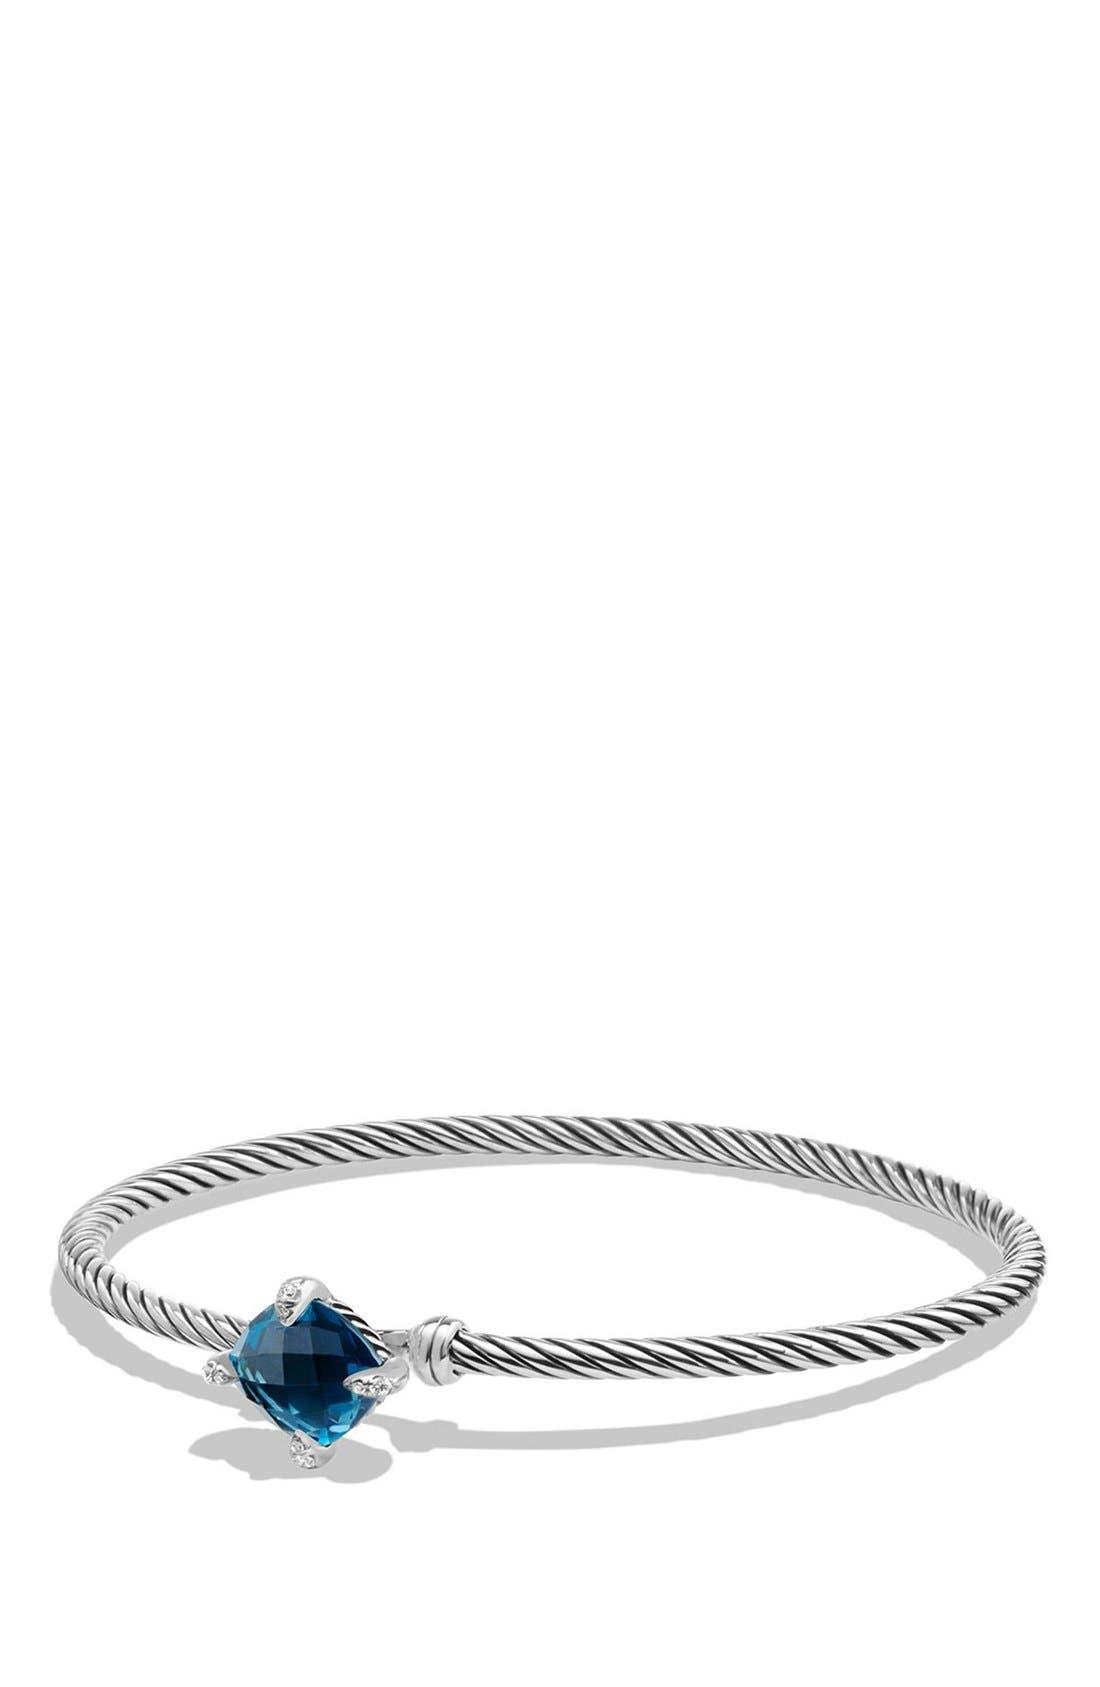 Alternate Image 1 Selected - David Yurman 'Châtelaine' Bracelet with Diamonds